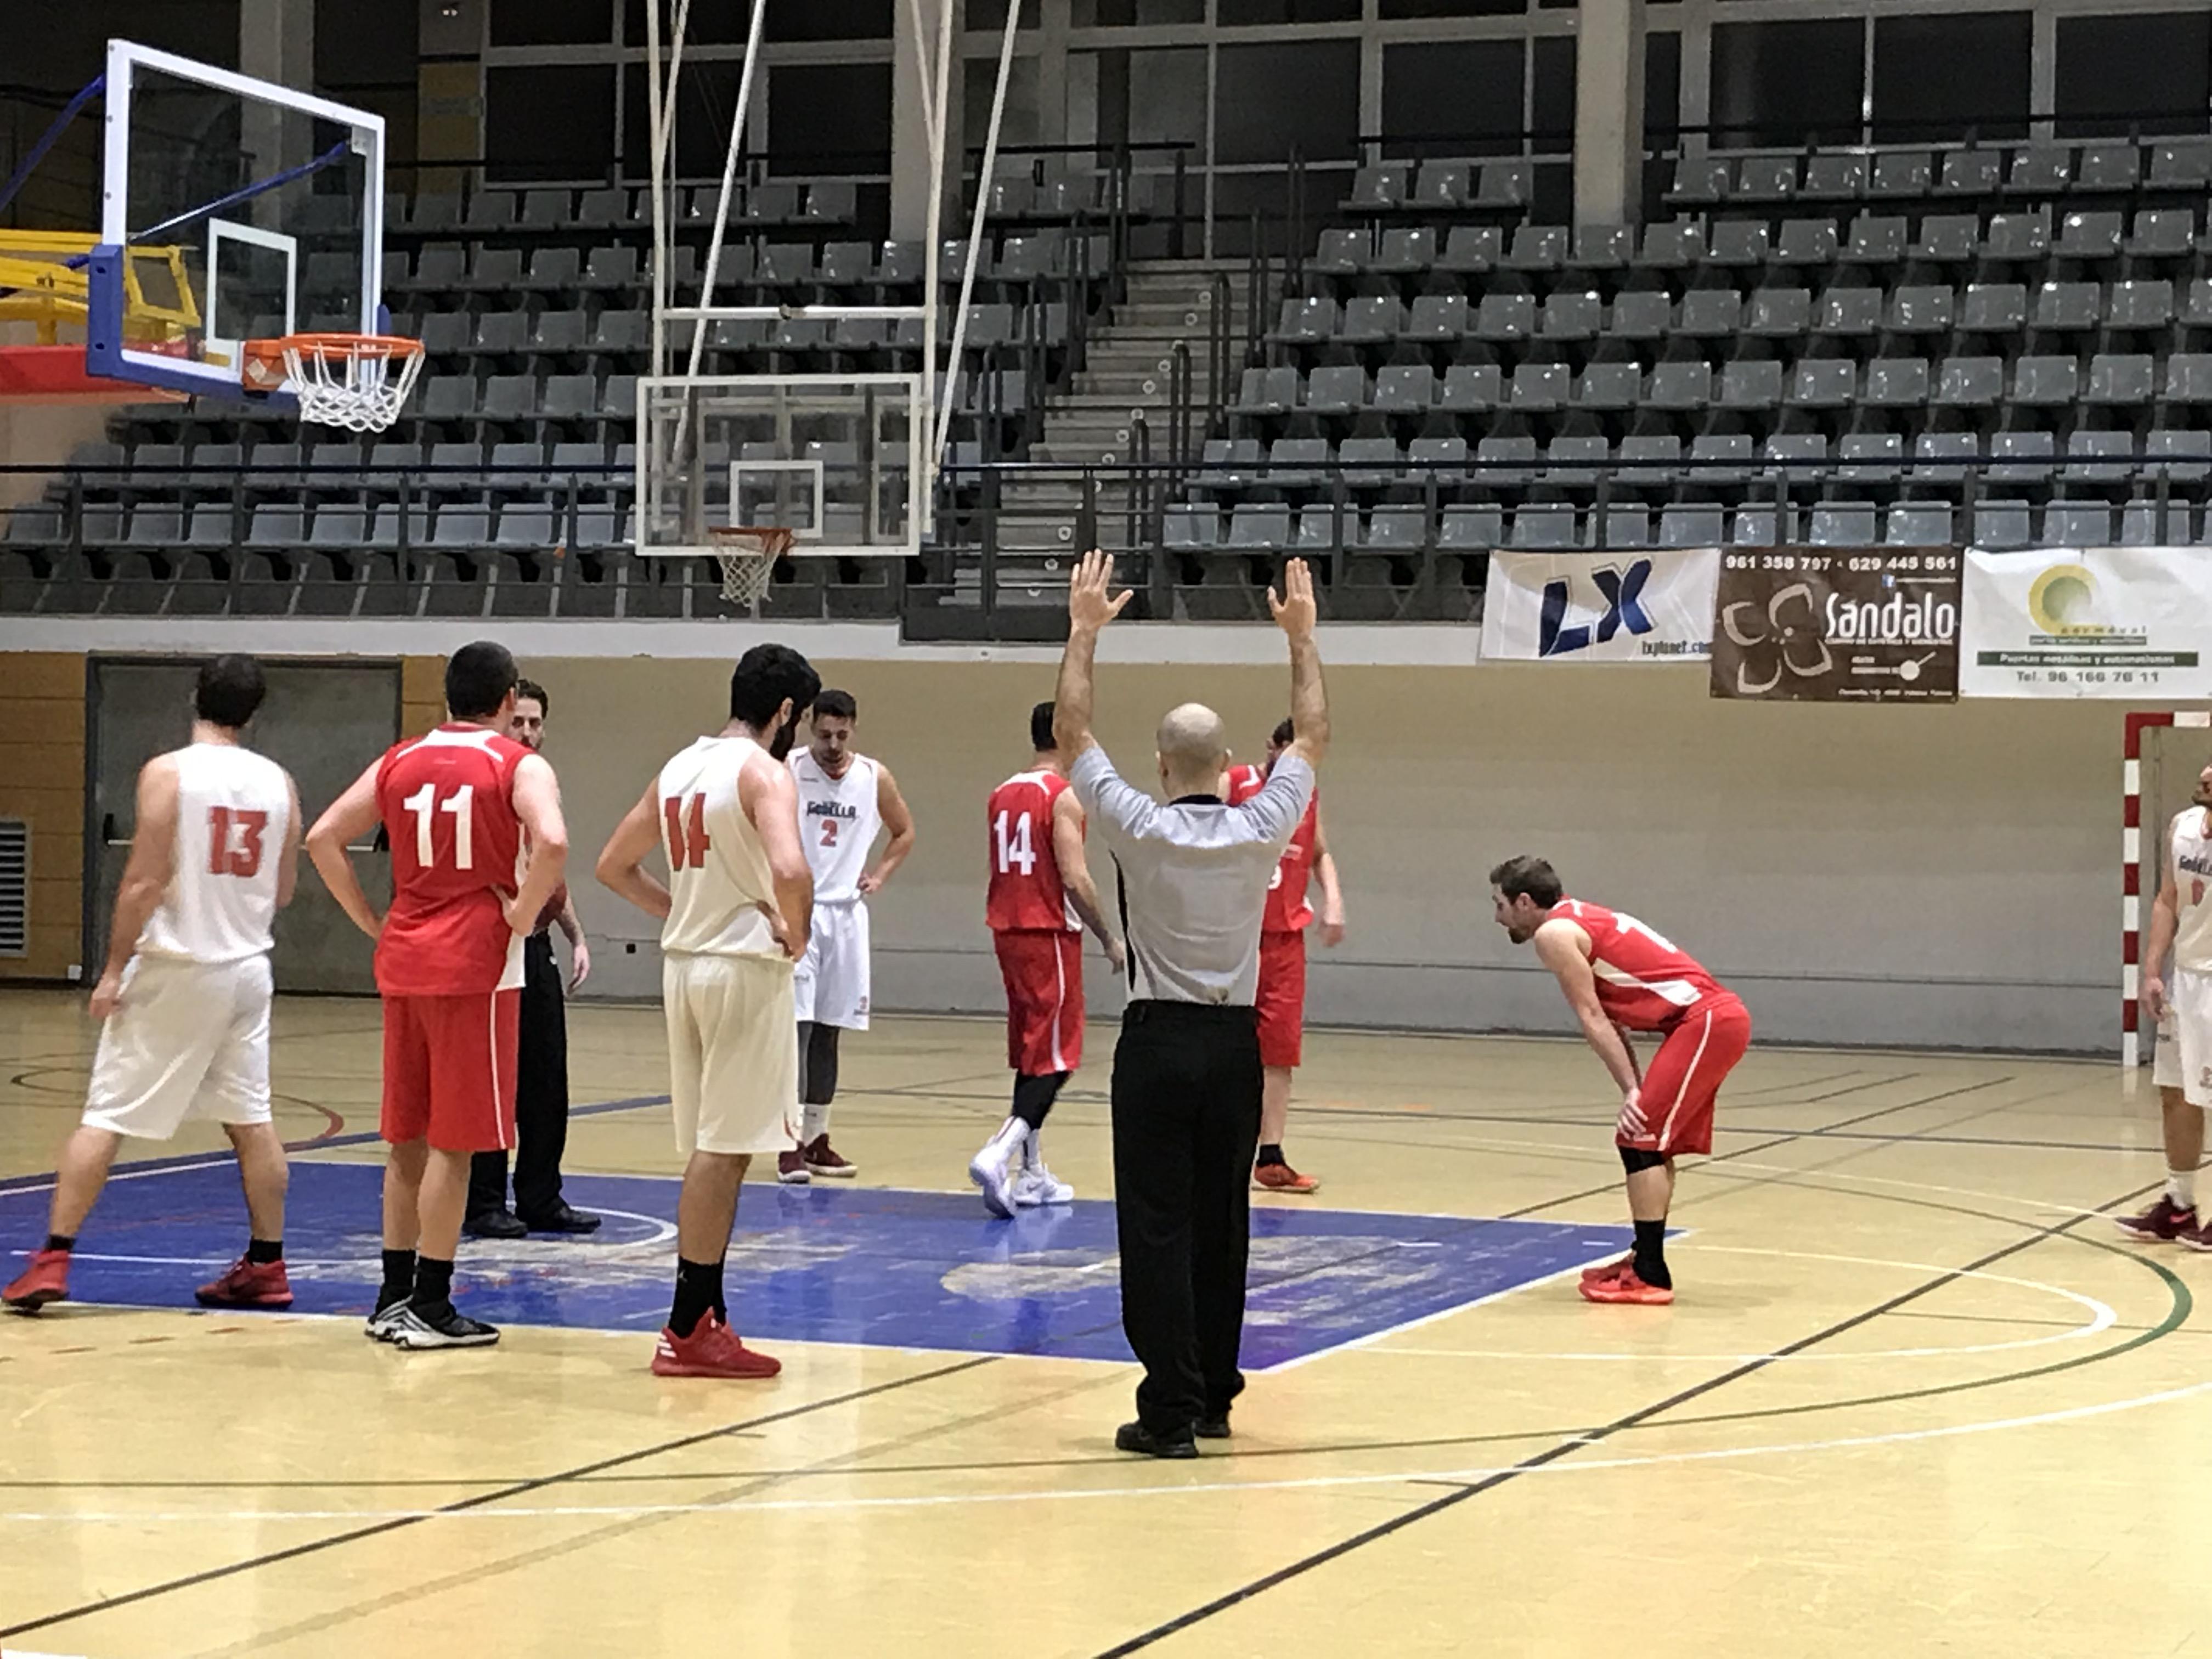 #SeniorMascA. Liga 1ª División Nacional. Jornada 19: Sonia CB L'Horta Godella 96 – ATC Colores Cerámicos Onda 56.